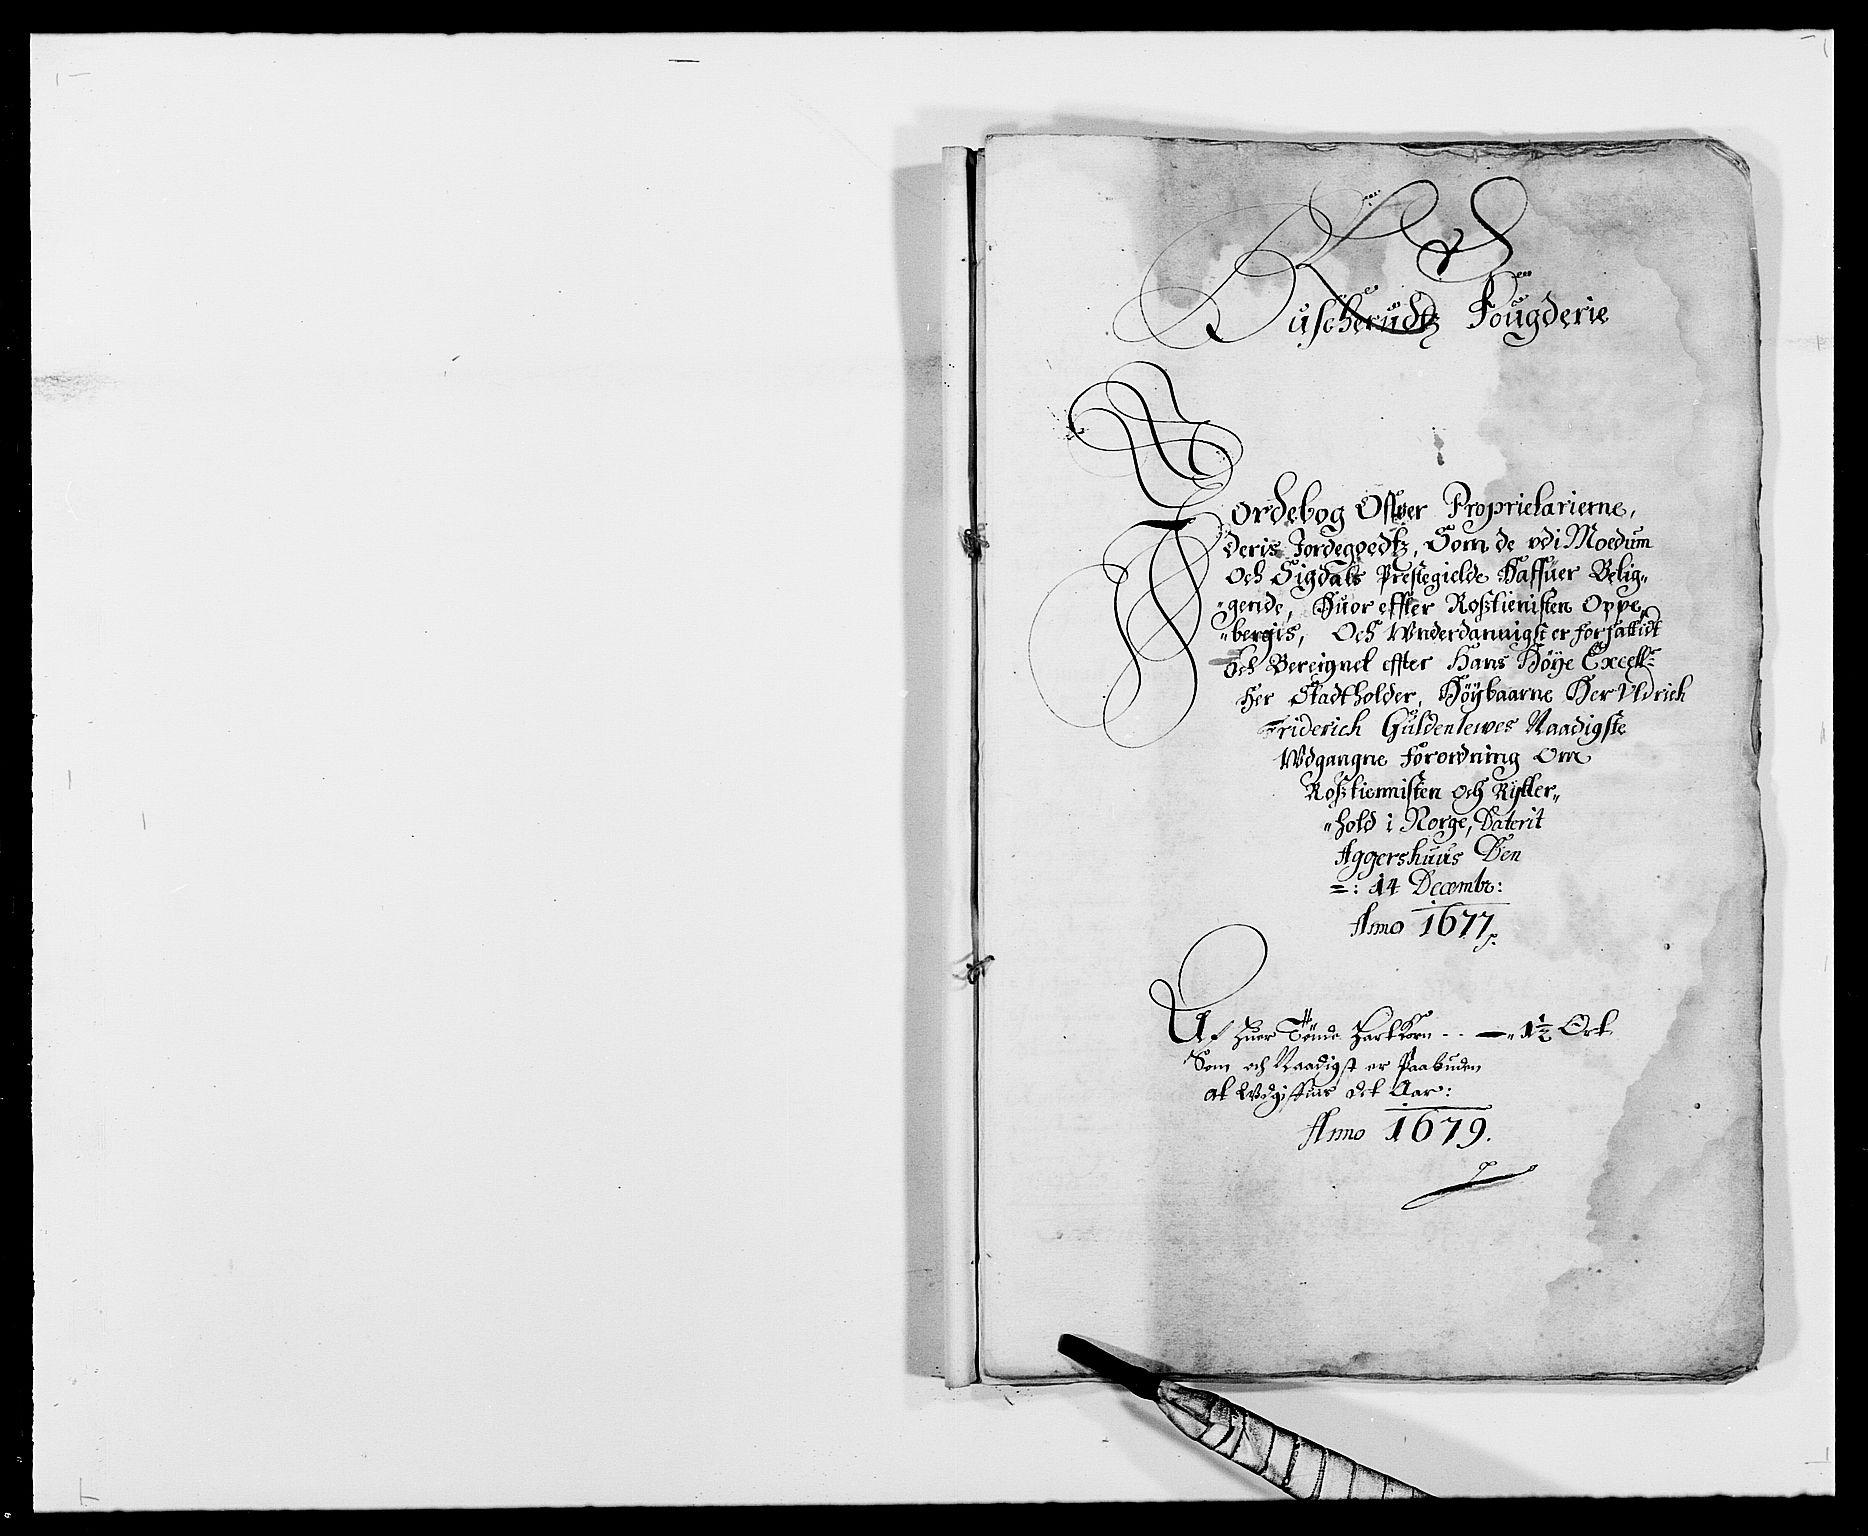 RA, Rentekammeret inntil 1814, Reviderte regnskaper, Fogderegnskap, R25/L1674: Fogderegnskap Buskerud, 1678-1681, s. 349